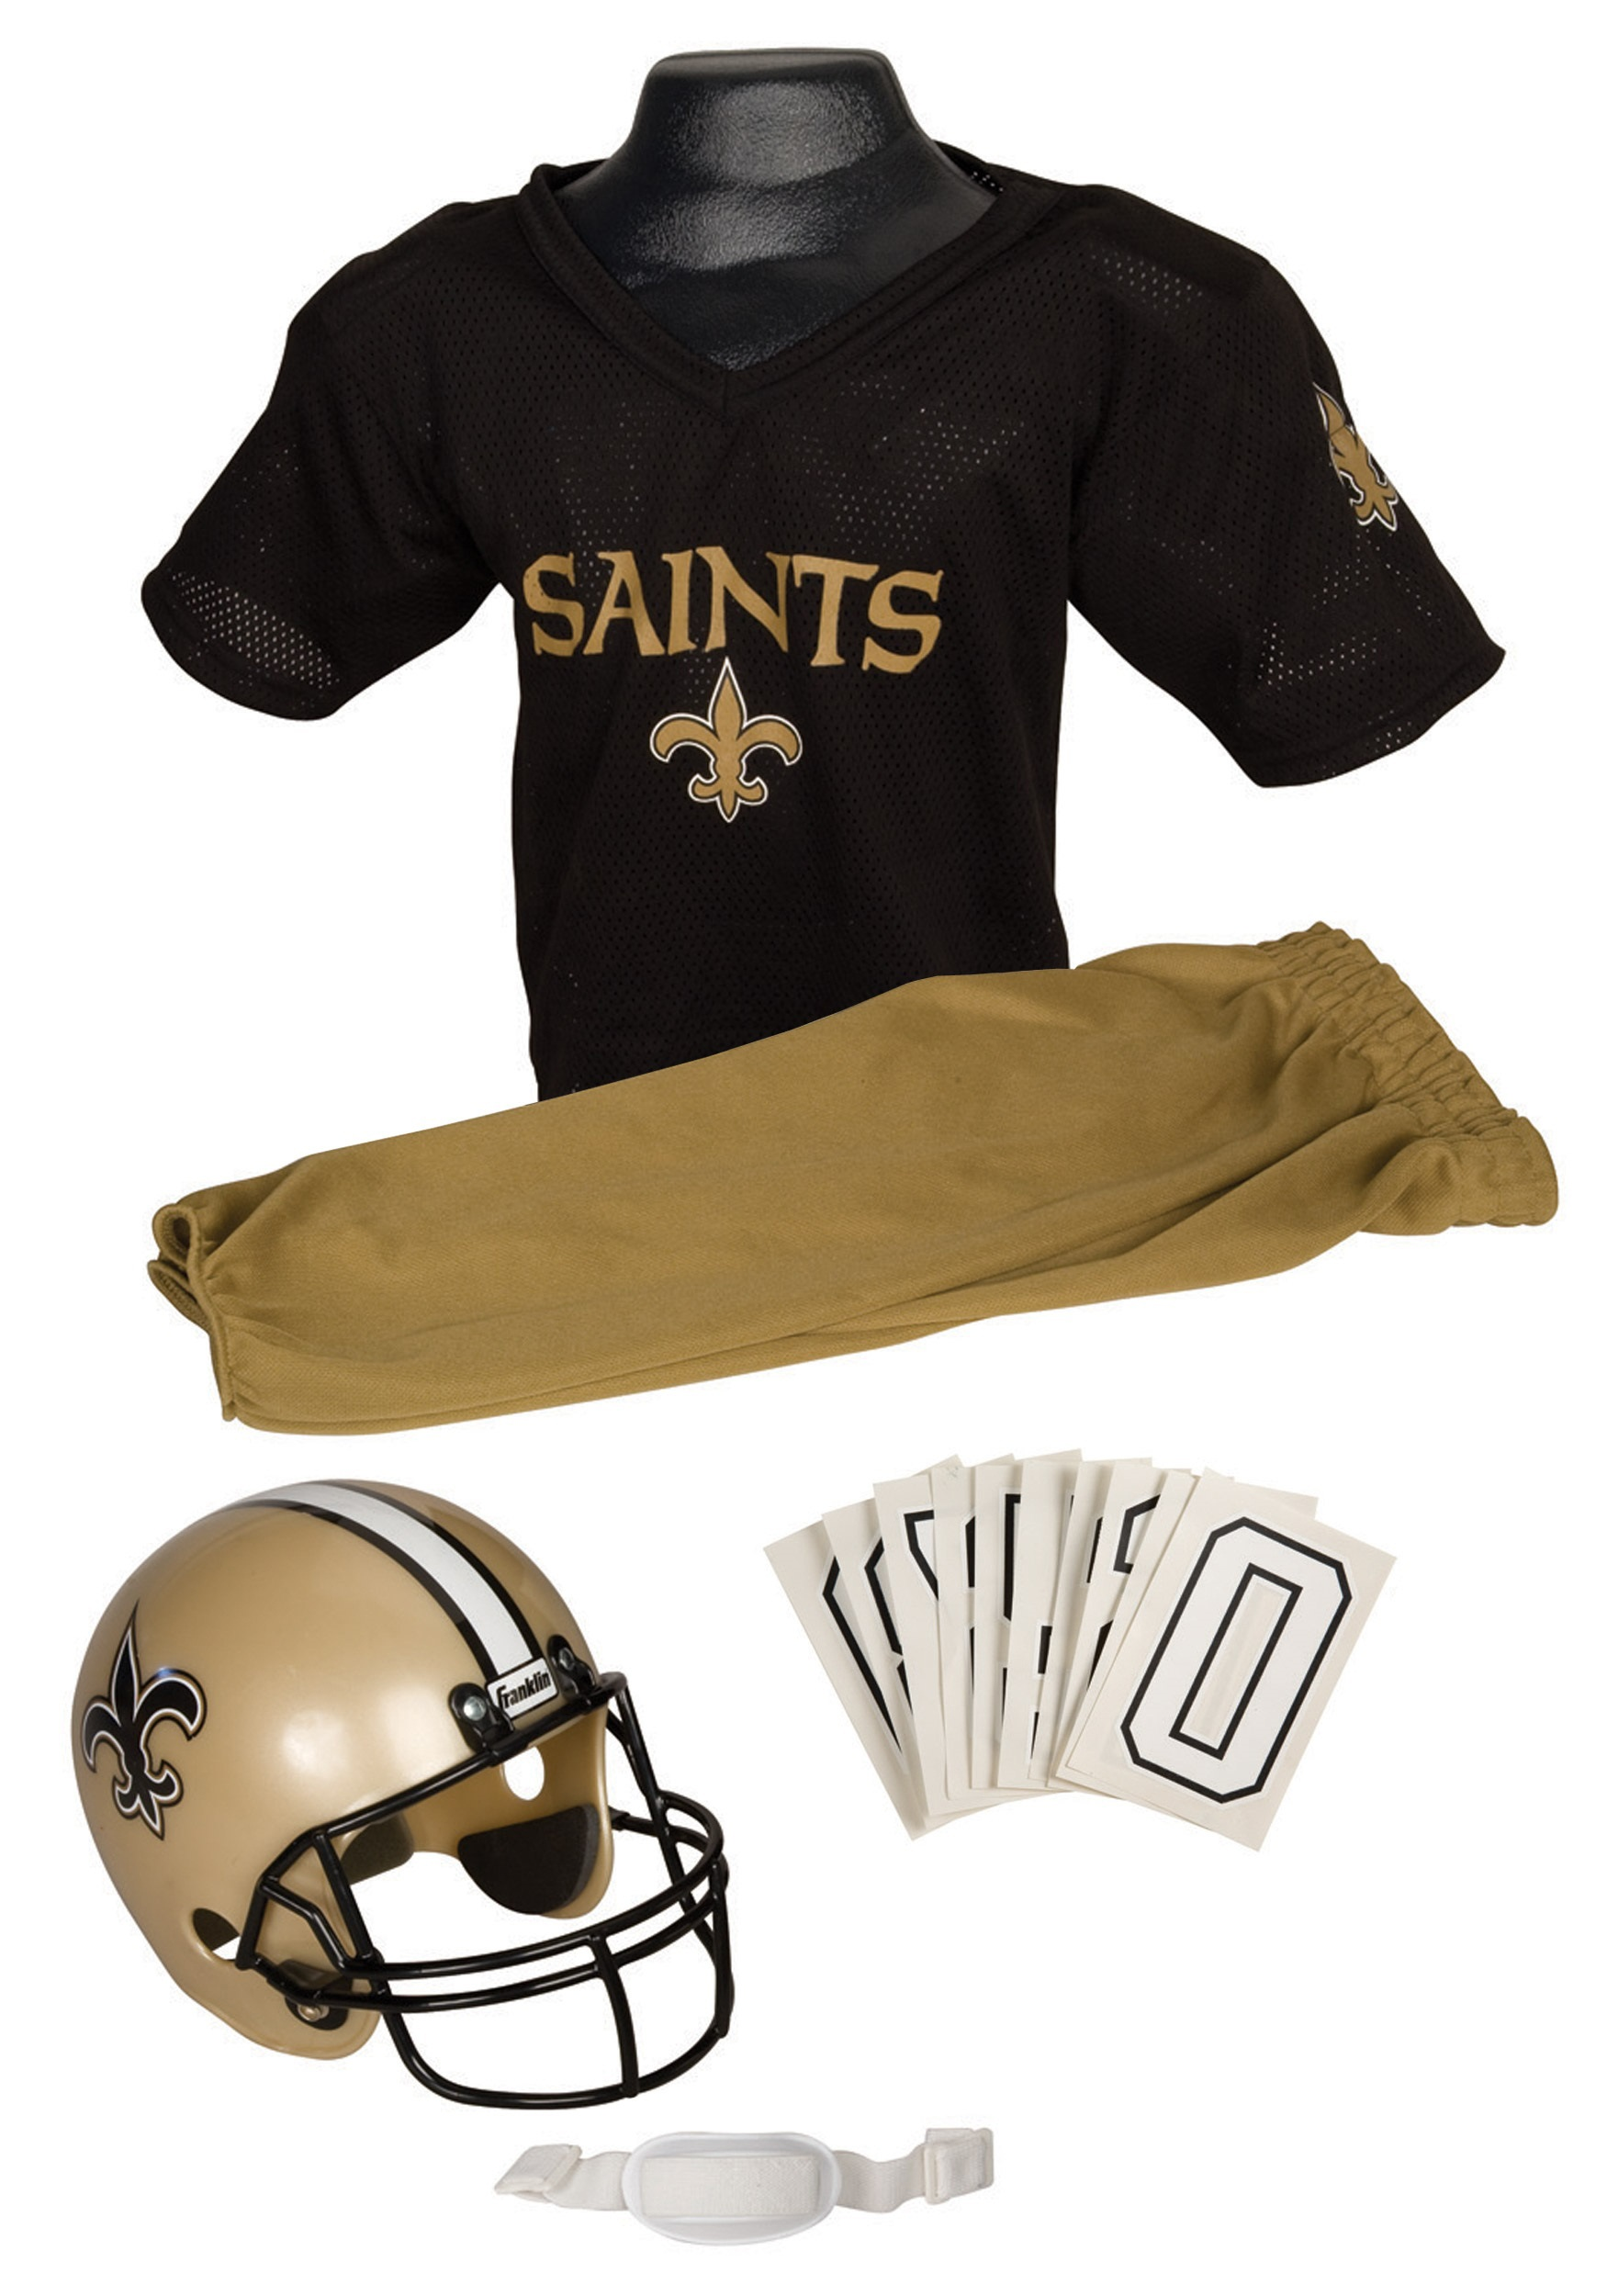 22f396e3 Kids NFL Saints Uniform Costume